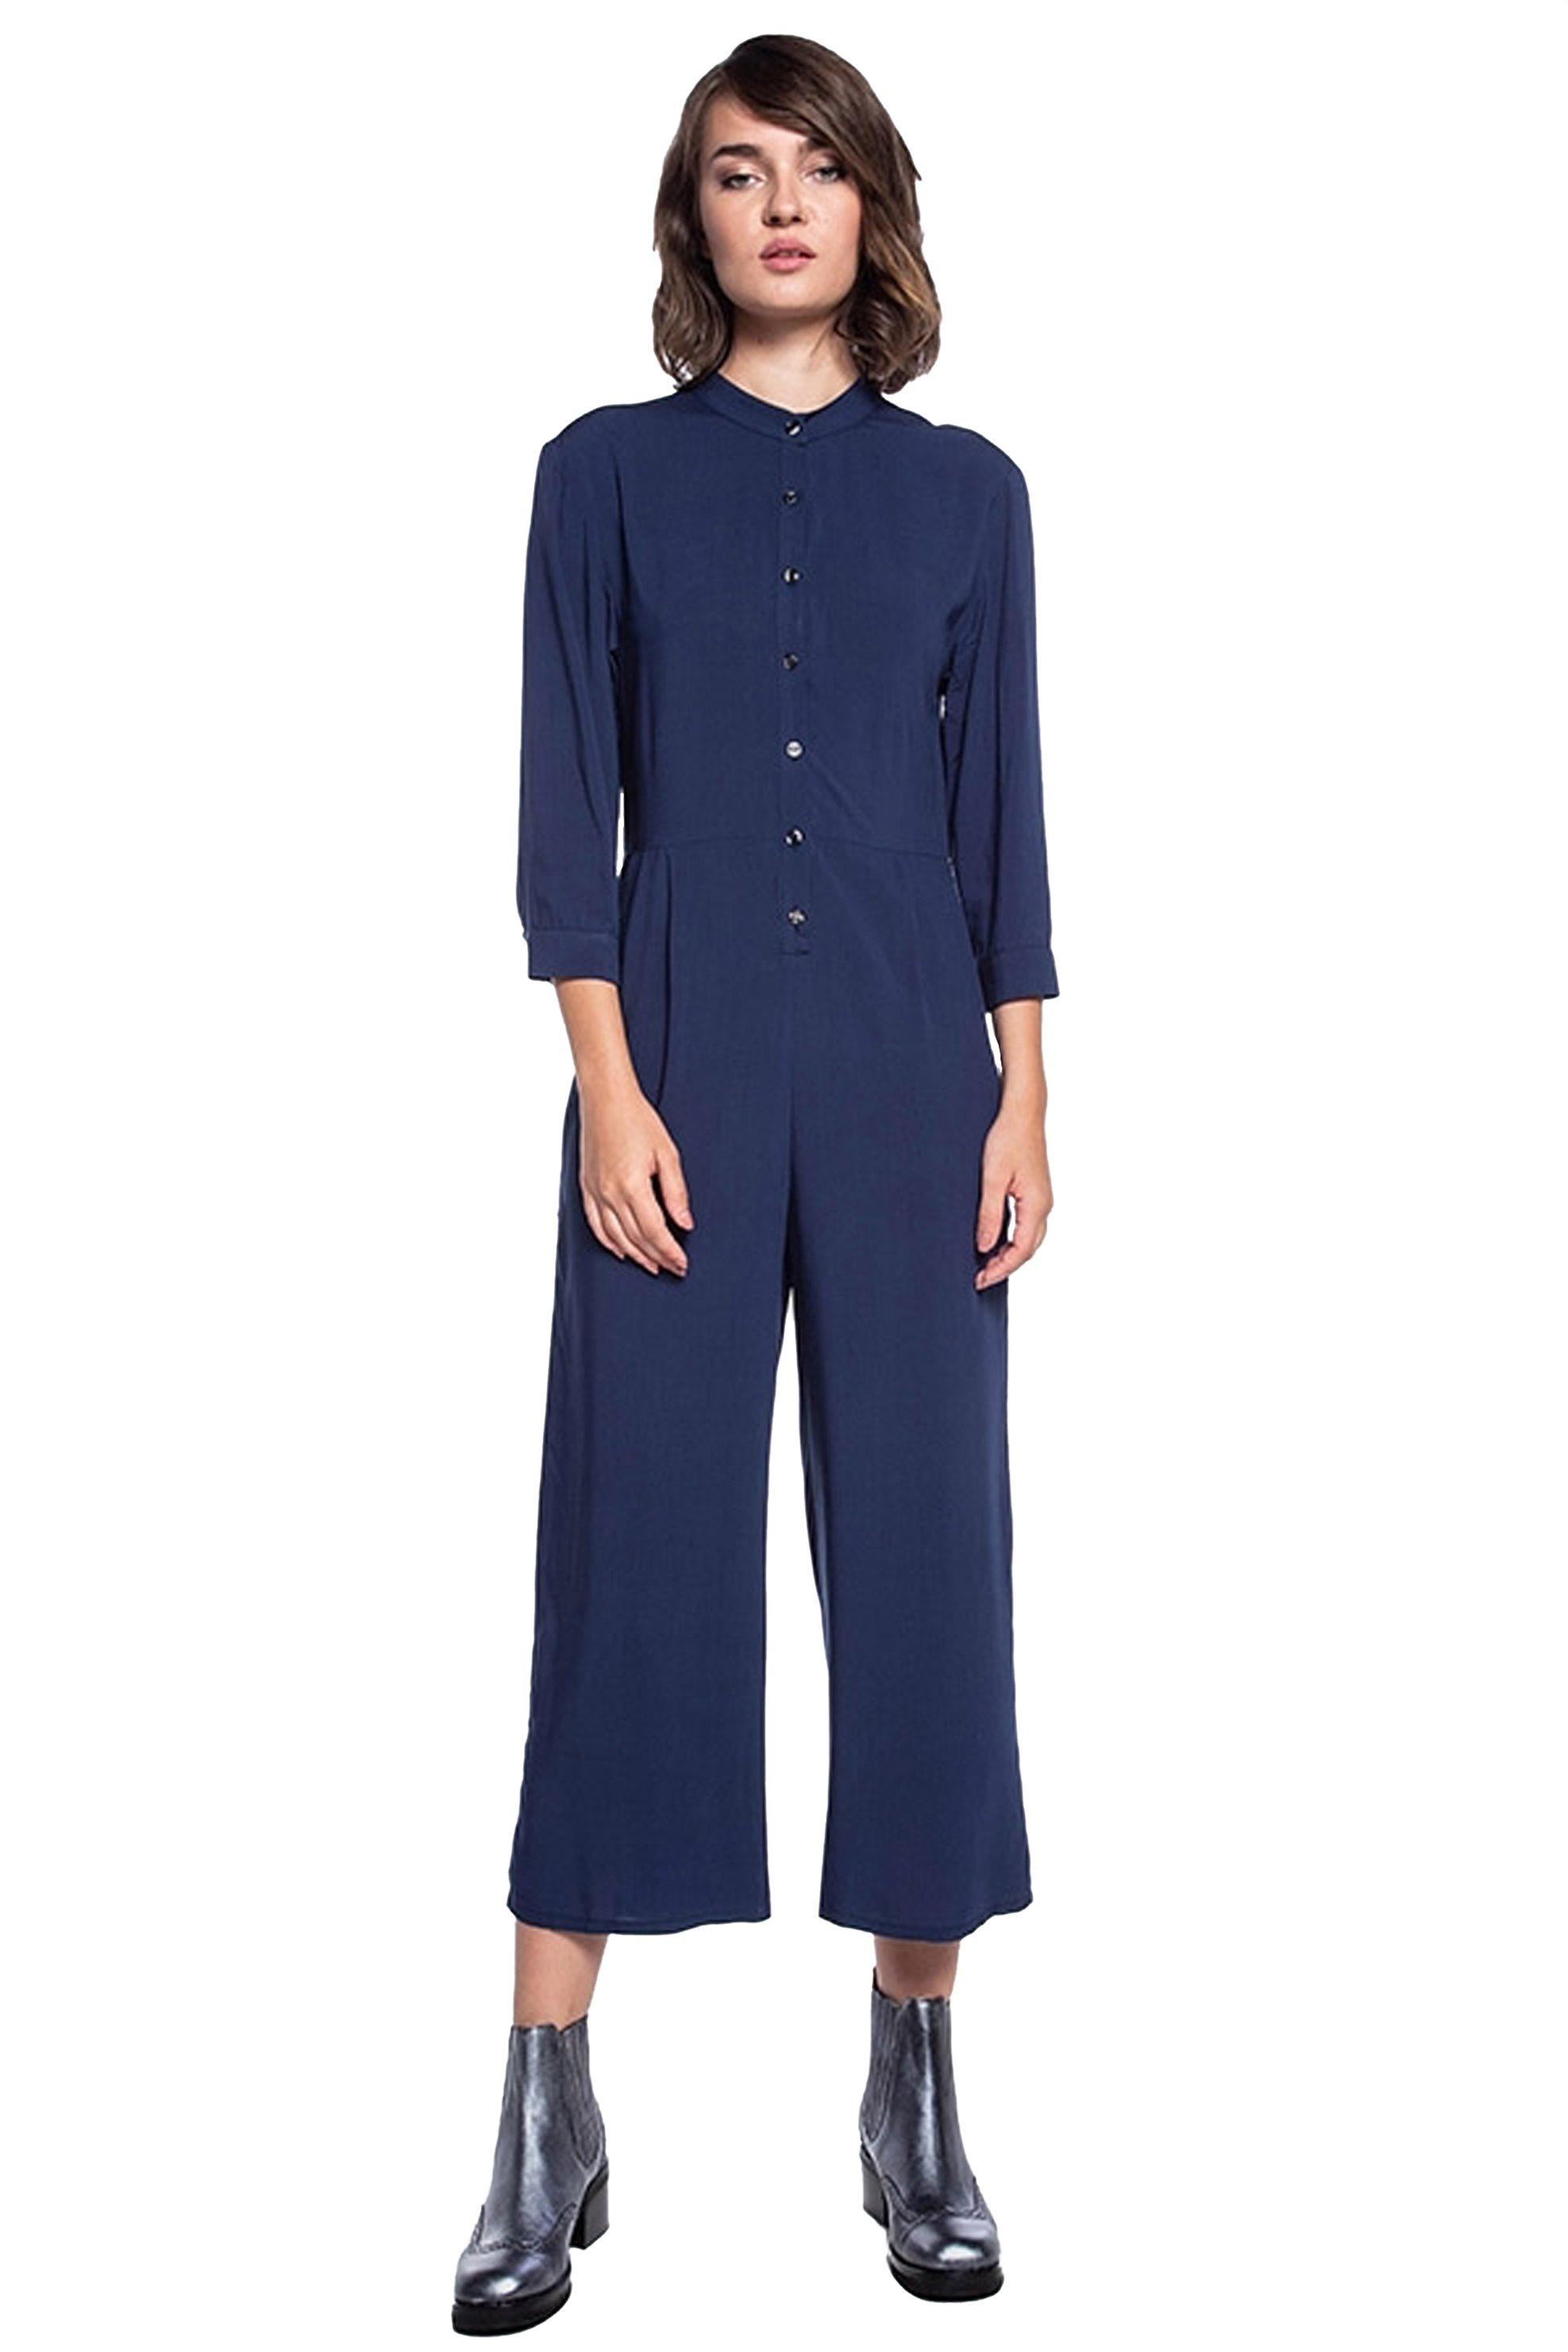 Helmi γυναικεία ολόσωμη φόρμα μονόχρωμη cropped - 42-25-006 - Μπλε γυναικα   ρουχα   ολόσωμες φόρμες   σαλοπέτες